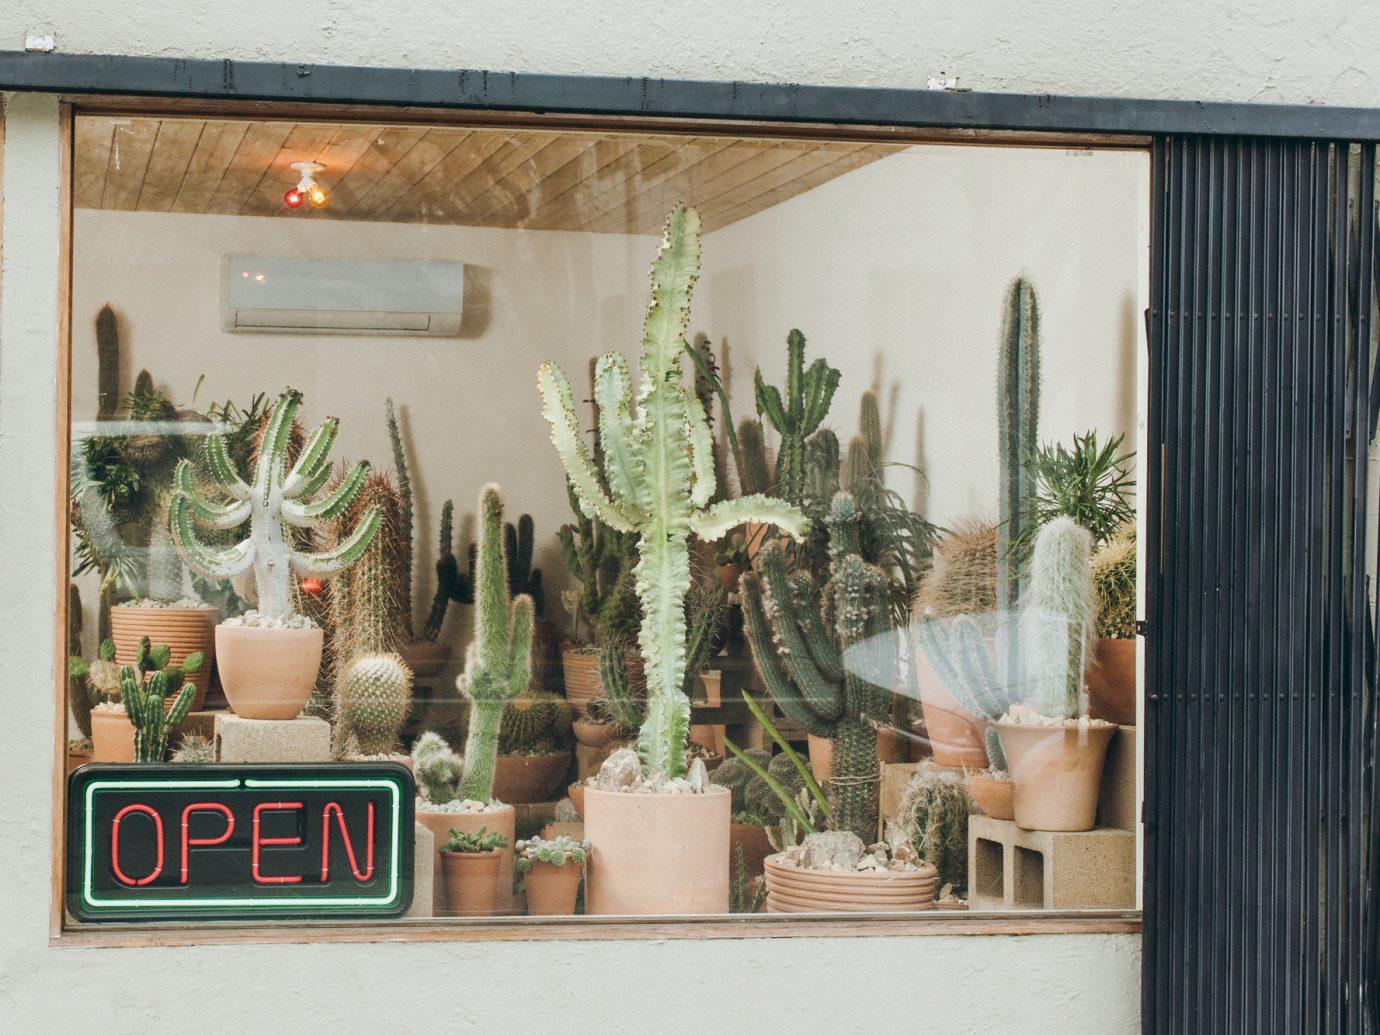 Offbeat Style + Design Travel Trends plant cactus flower floristry window floral design